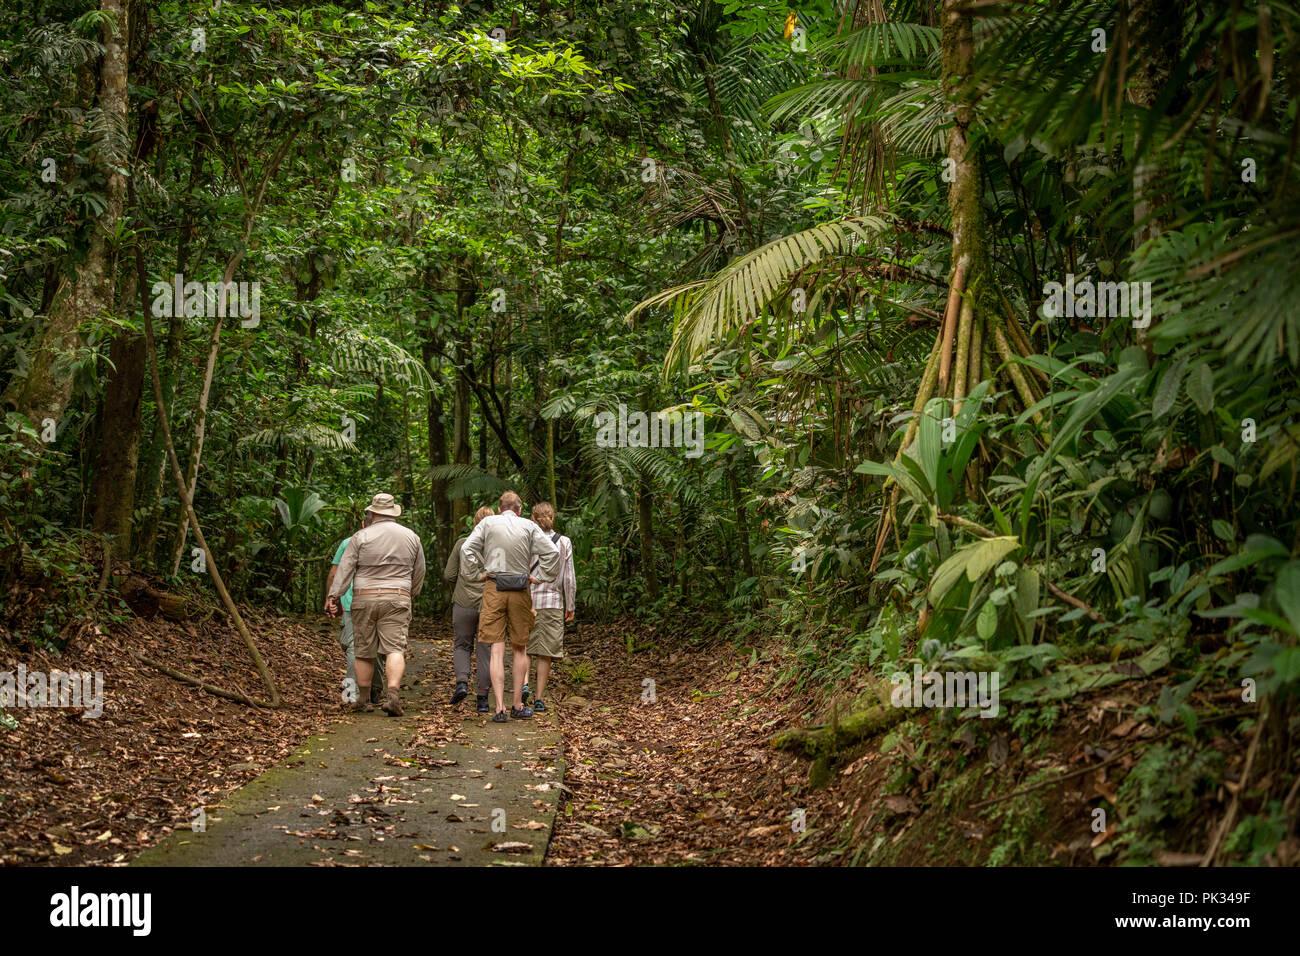 Touristen, Tenorio Volcano National Park, Costa Rica Stockbild